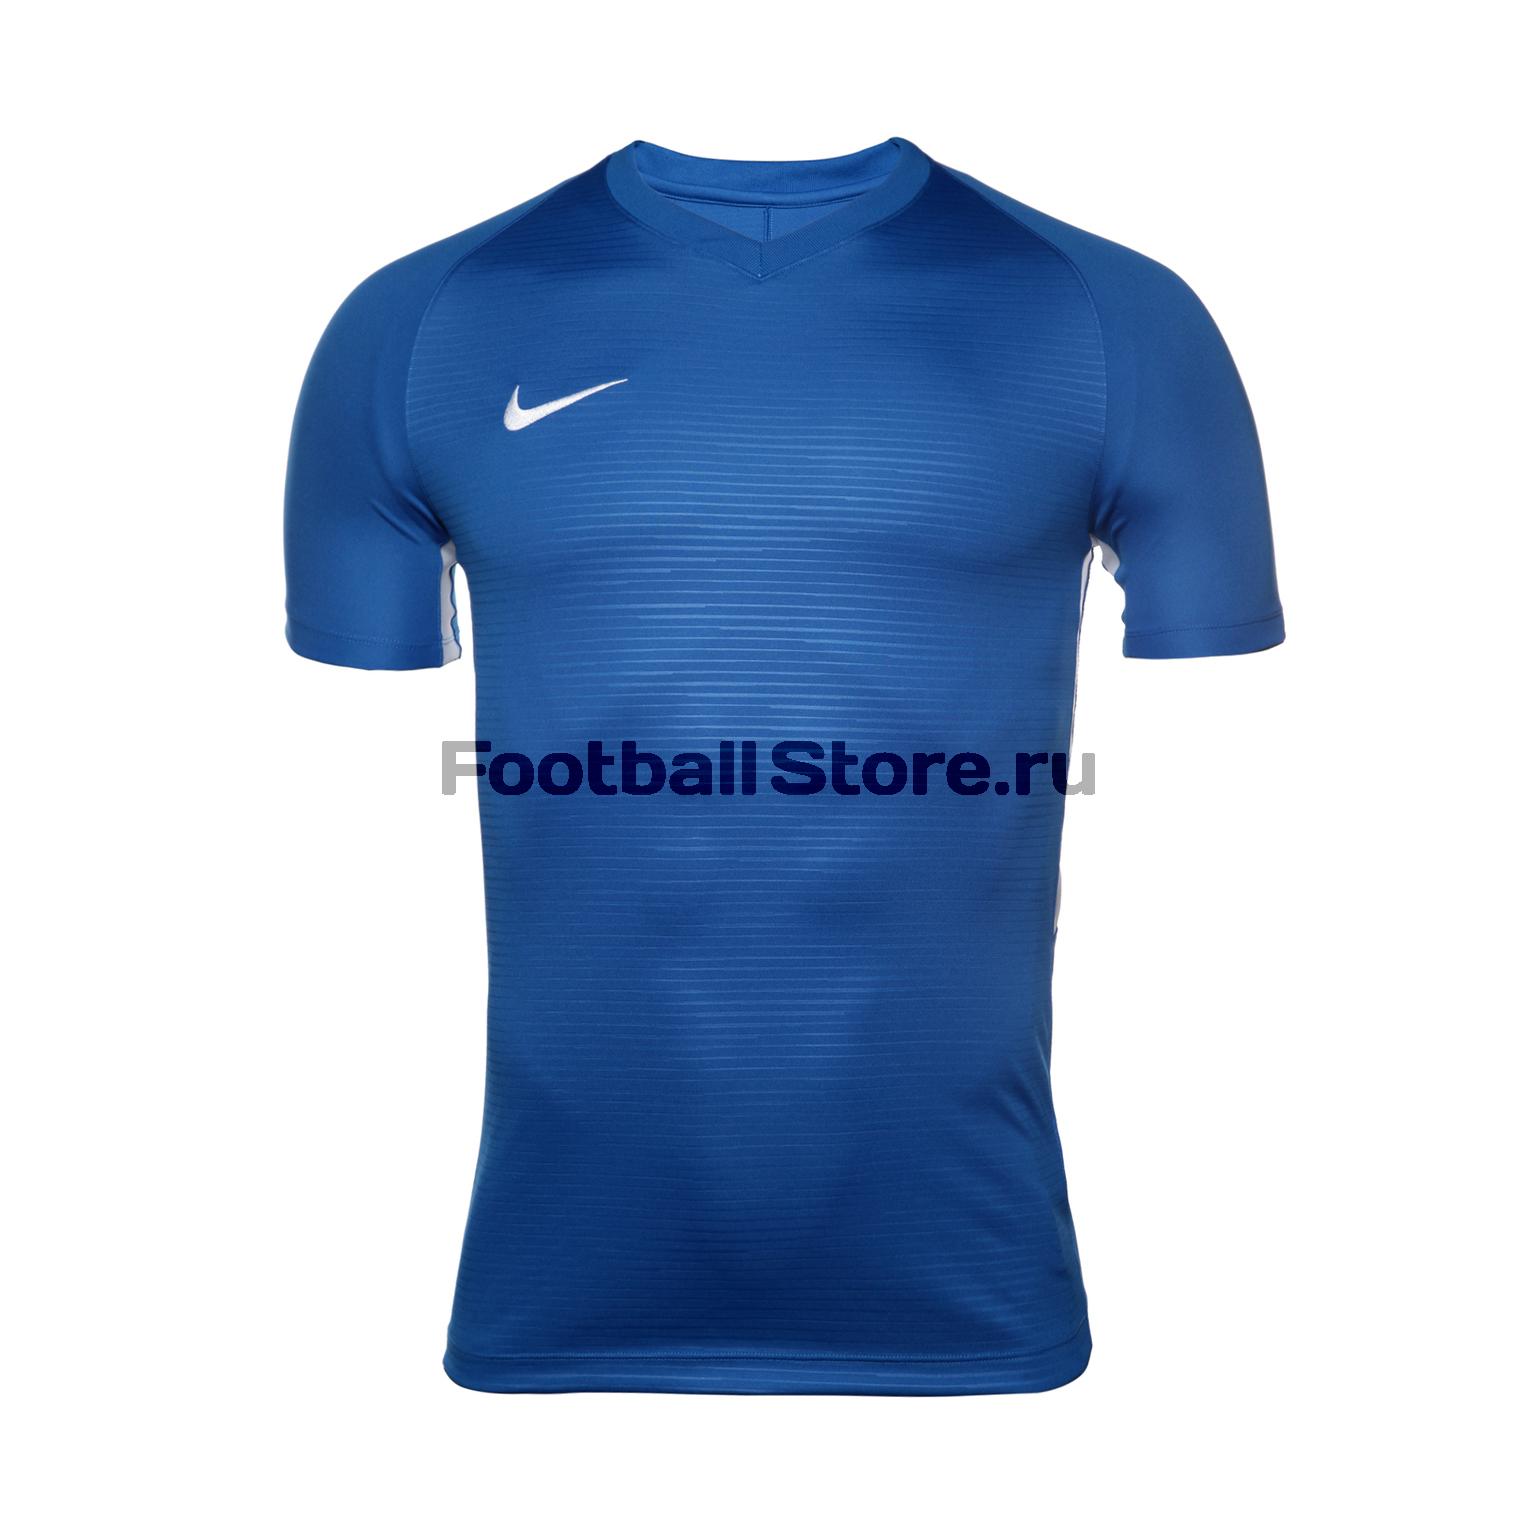 Футболка игровая Nike Dry Tiempo Prem JSY SS 894230-463 nike футболка zenit ss h a stadium jsy